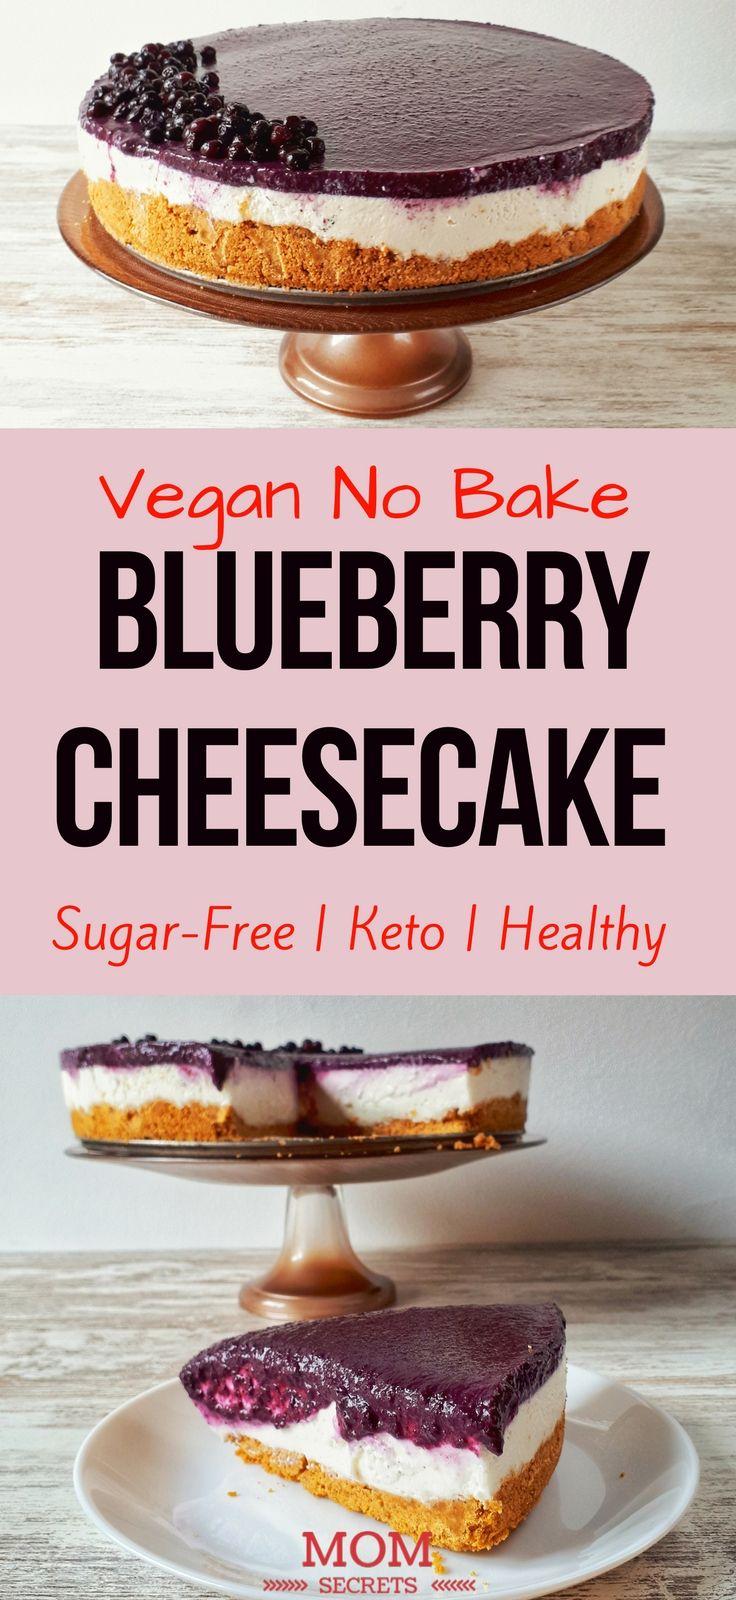 Vegan Blueberry Cheesecake With Raw Cashwes No Bake Sugar Free Keto Healthy Recipe Keto Dessert Easy Vegan Blueberry Cheesecake Recipe Blueberry Cheesecake Recipe